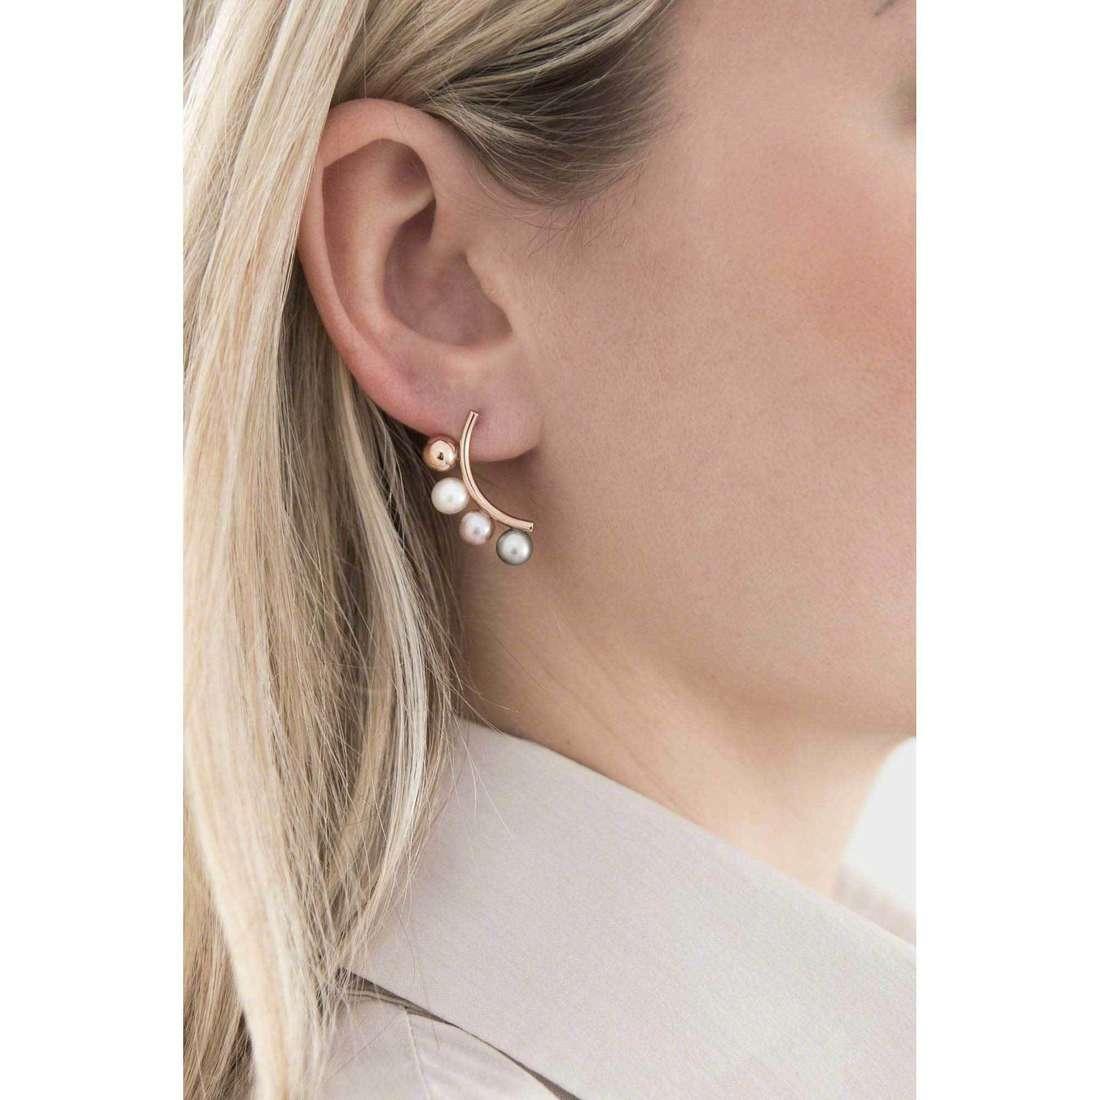 Morellato boucles d'oreille Lunae femme SADX03 indosso